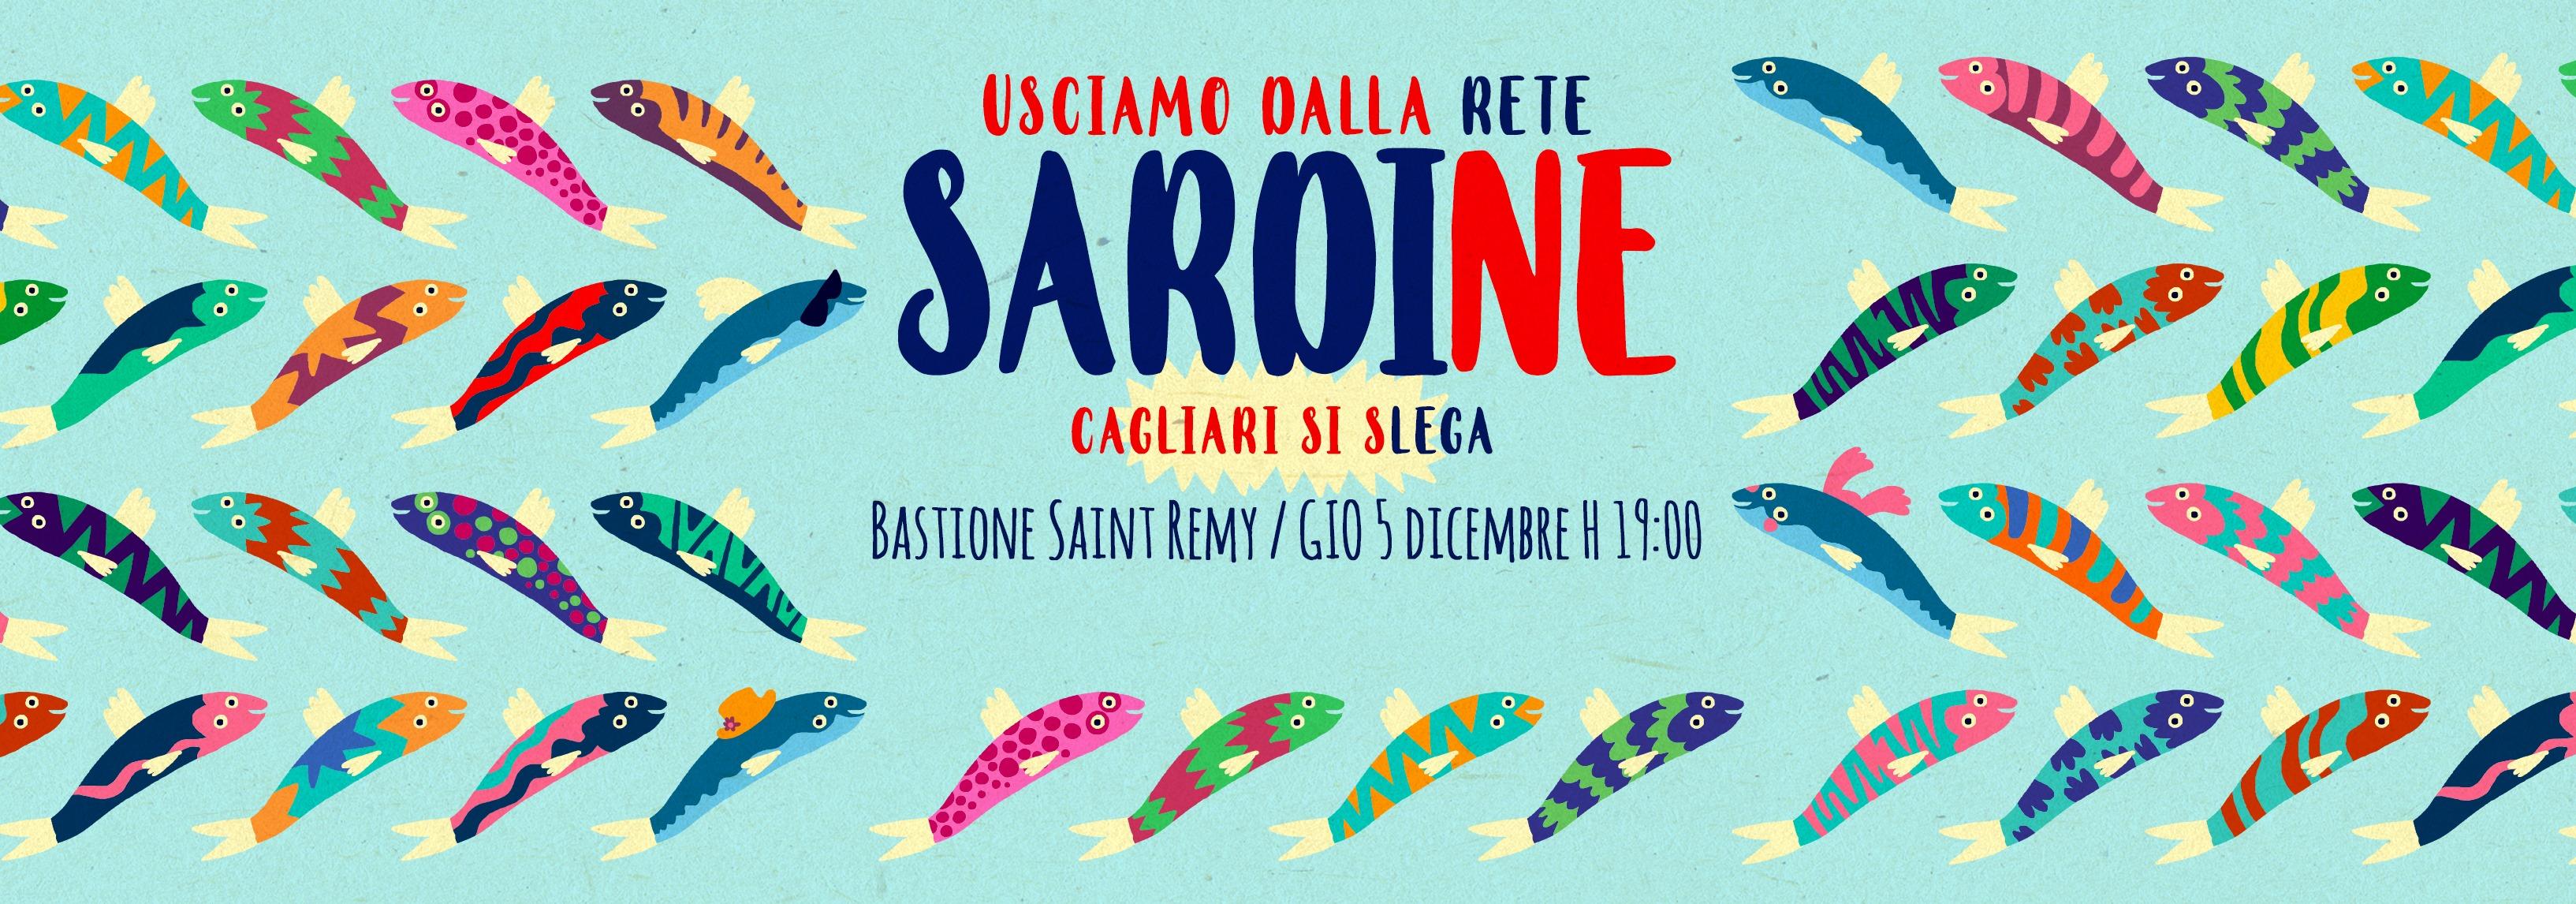 sardine-ca-sar-5-dic19